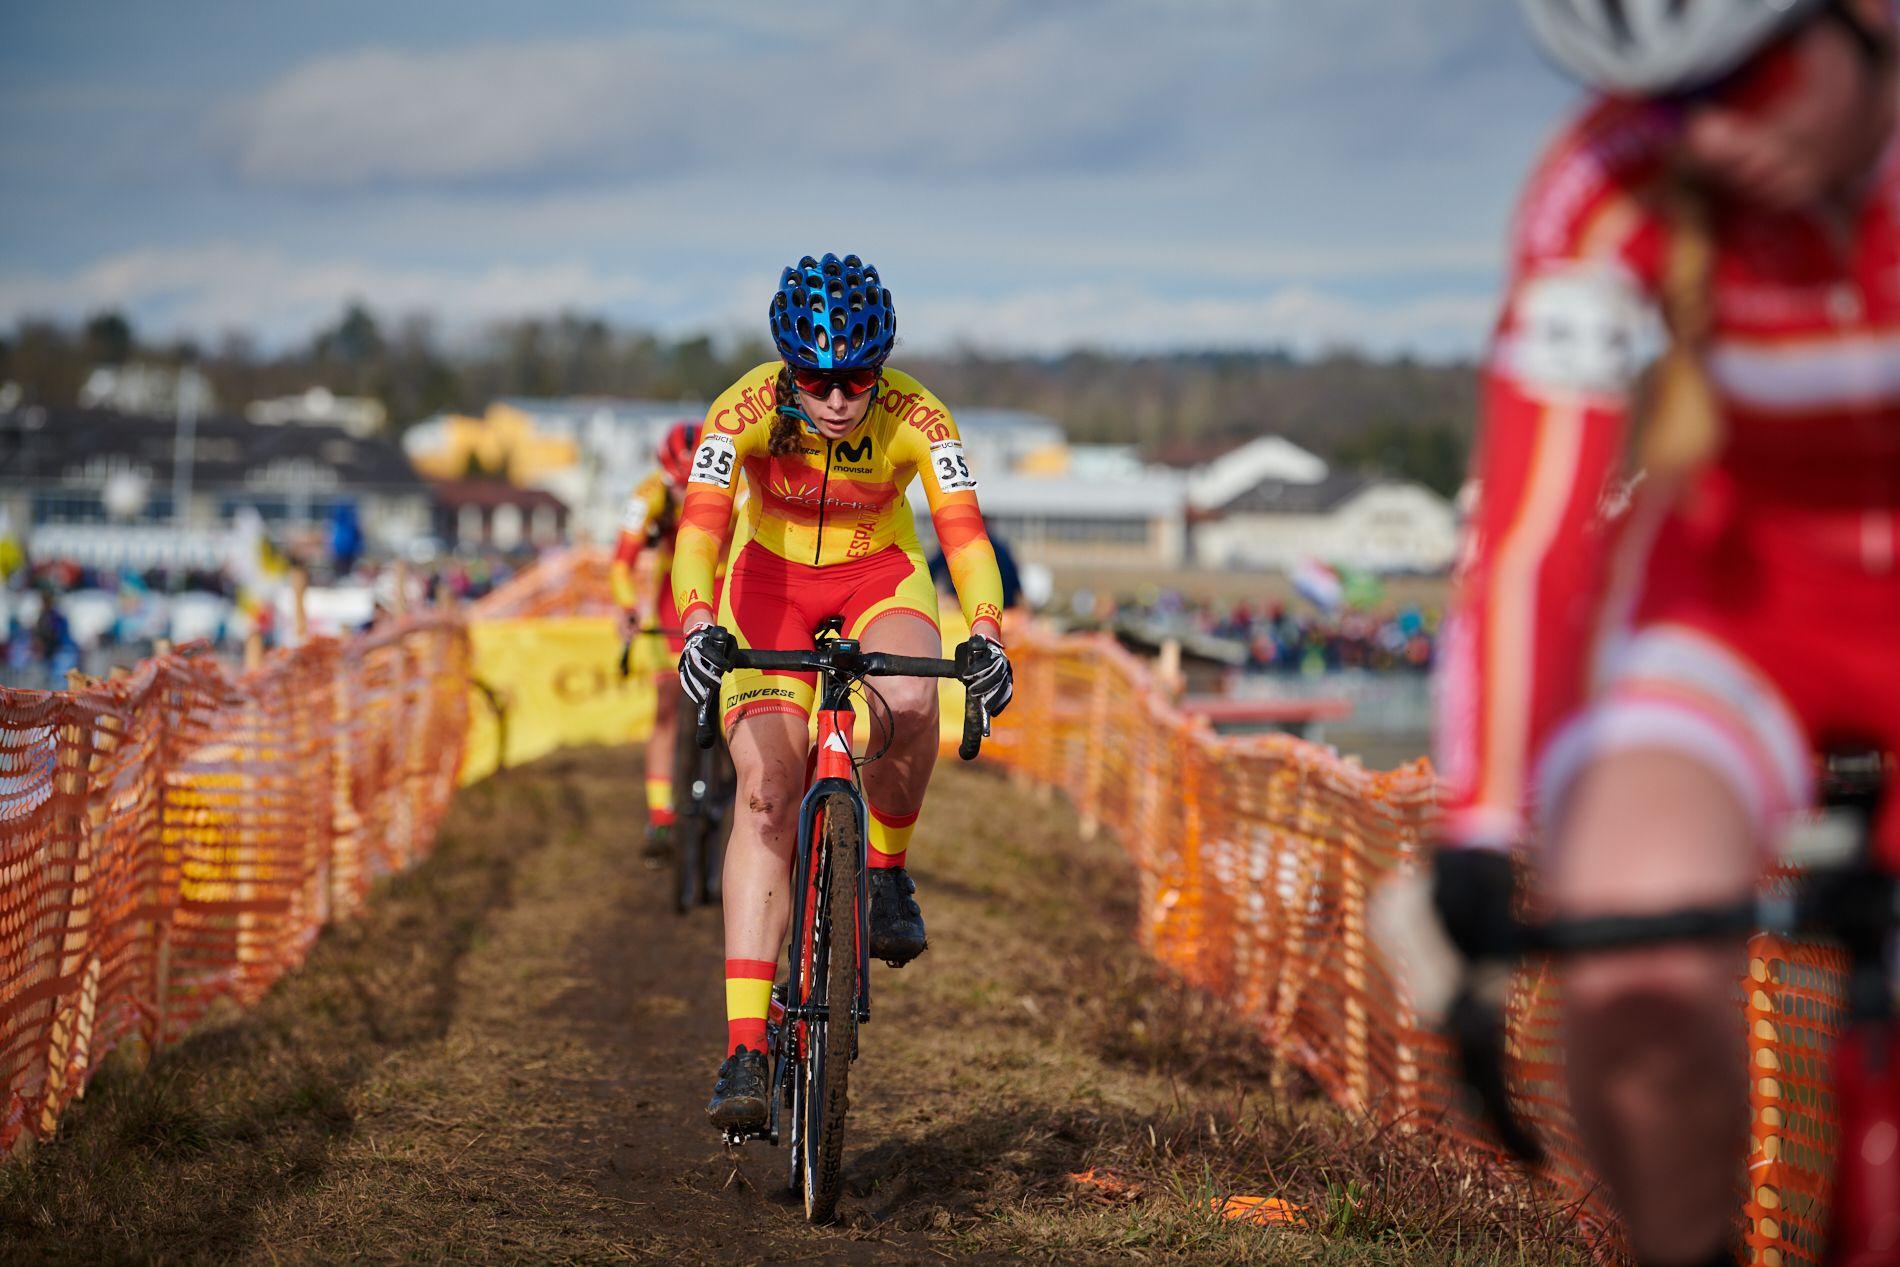 #TeamESPciclismo / Mundial de Ciclocross 2020, Dubendorf